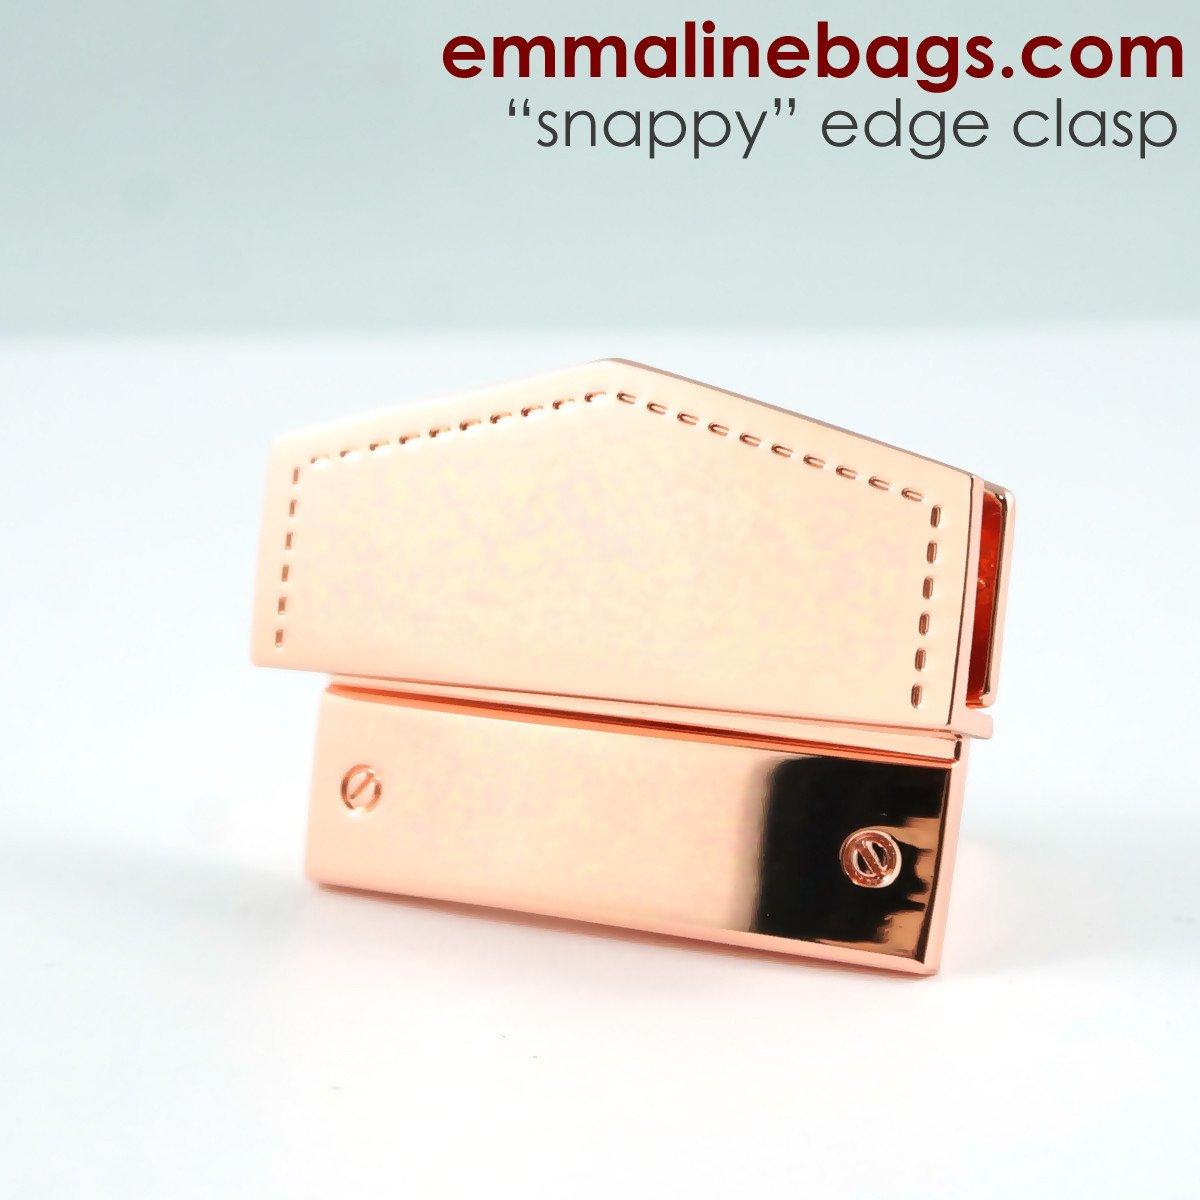 Emmaline - Long John Strap Anchors - 4 Pack